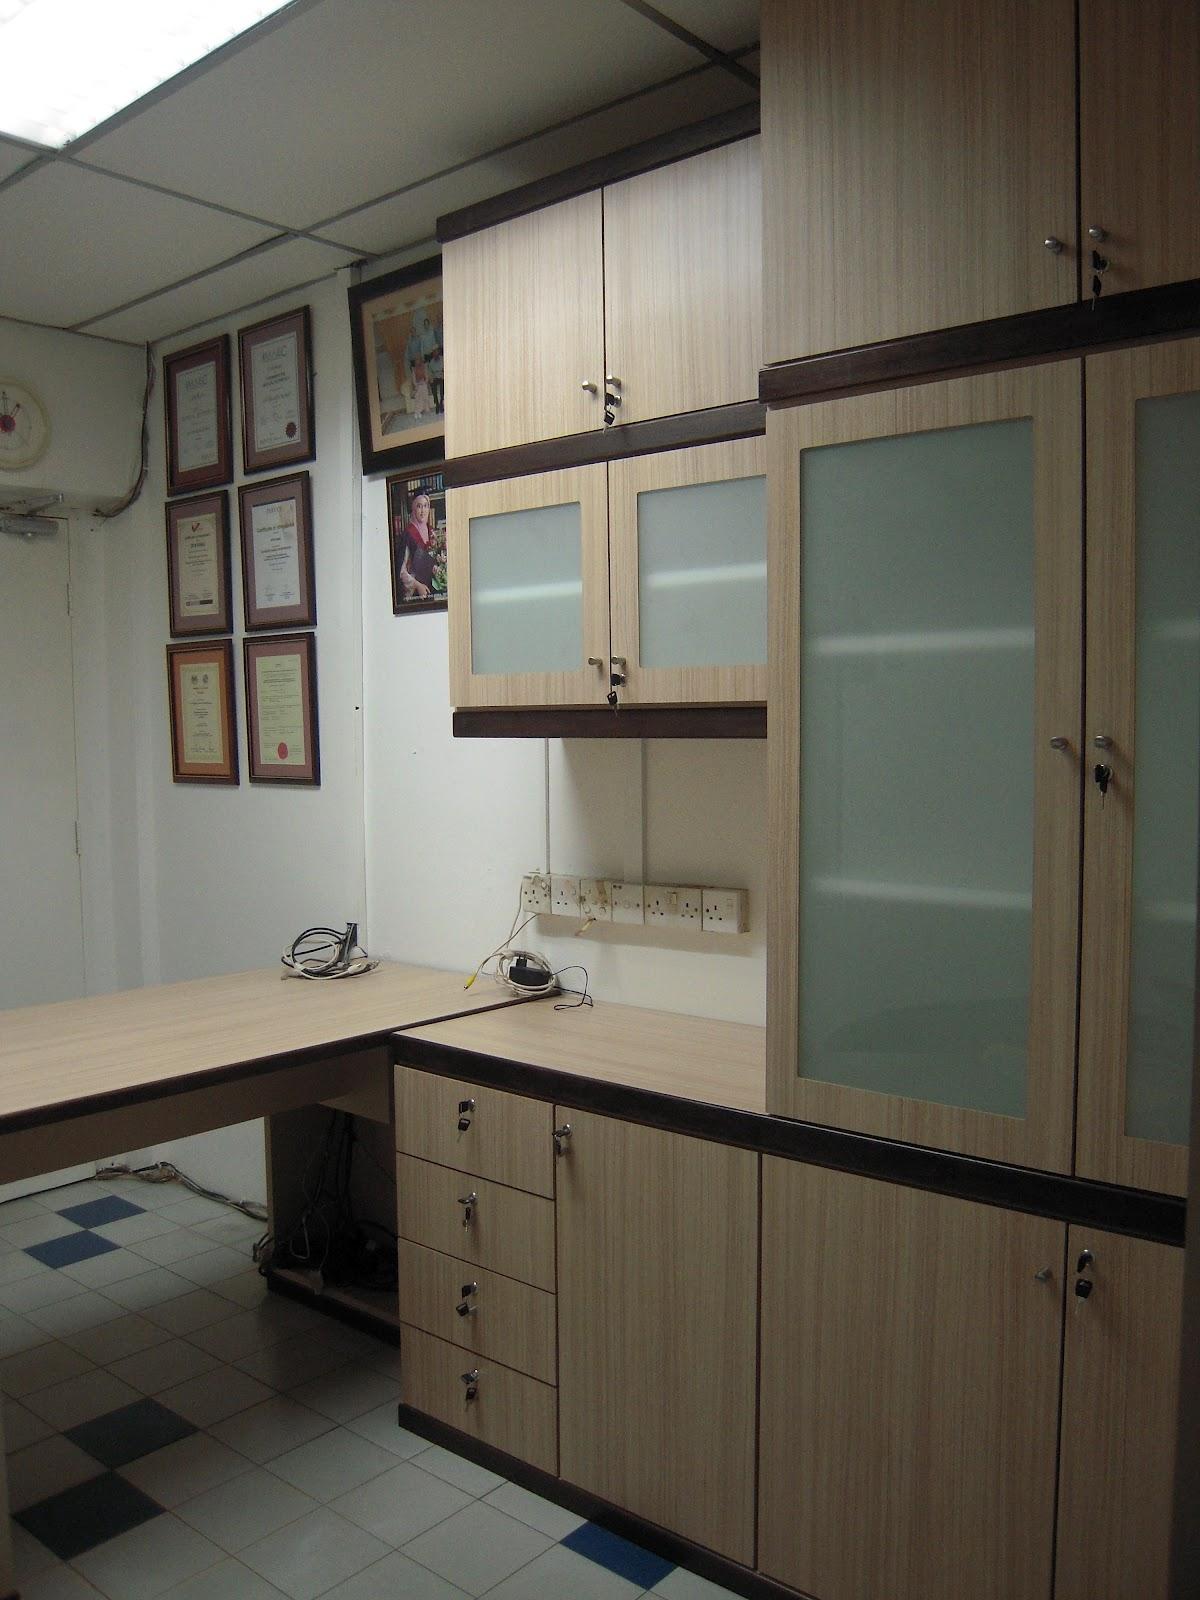 Akmida Furniture Home Accessories Sdn Bhd Klinik Haydar Kamal Kota Bharu